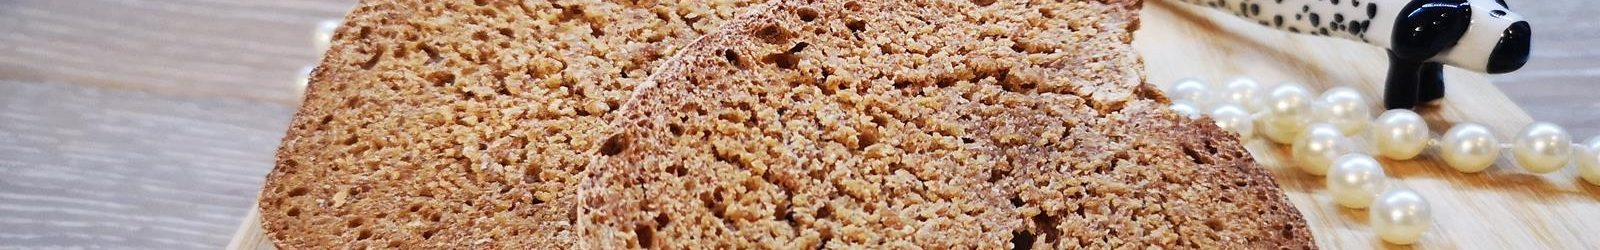 Fette biscottate integrali light Dieta Dukan La ricetta